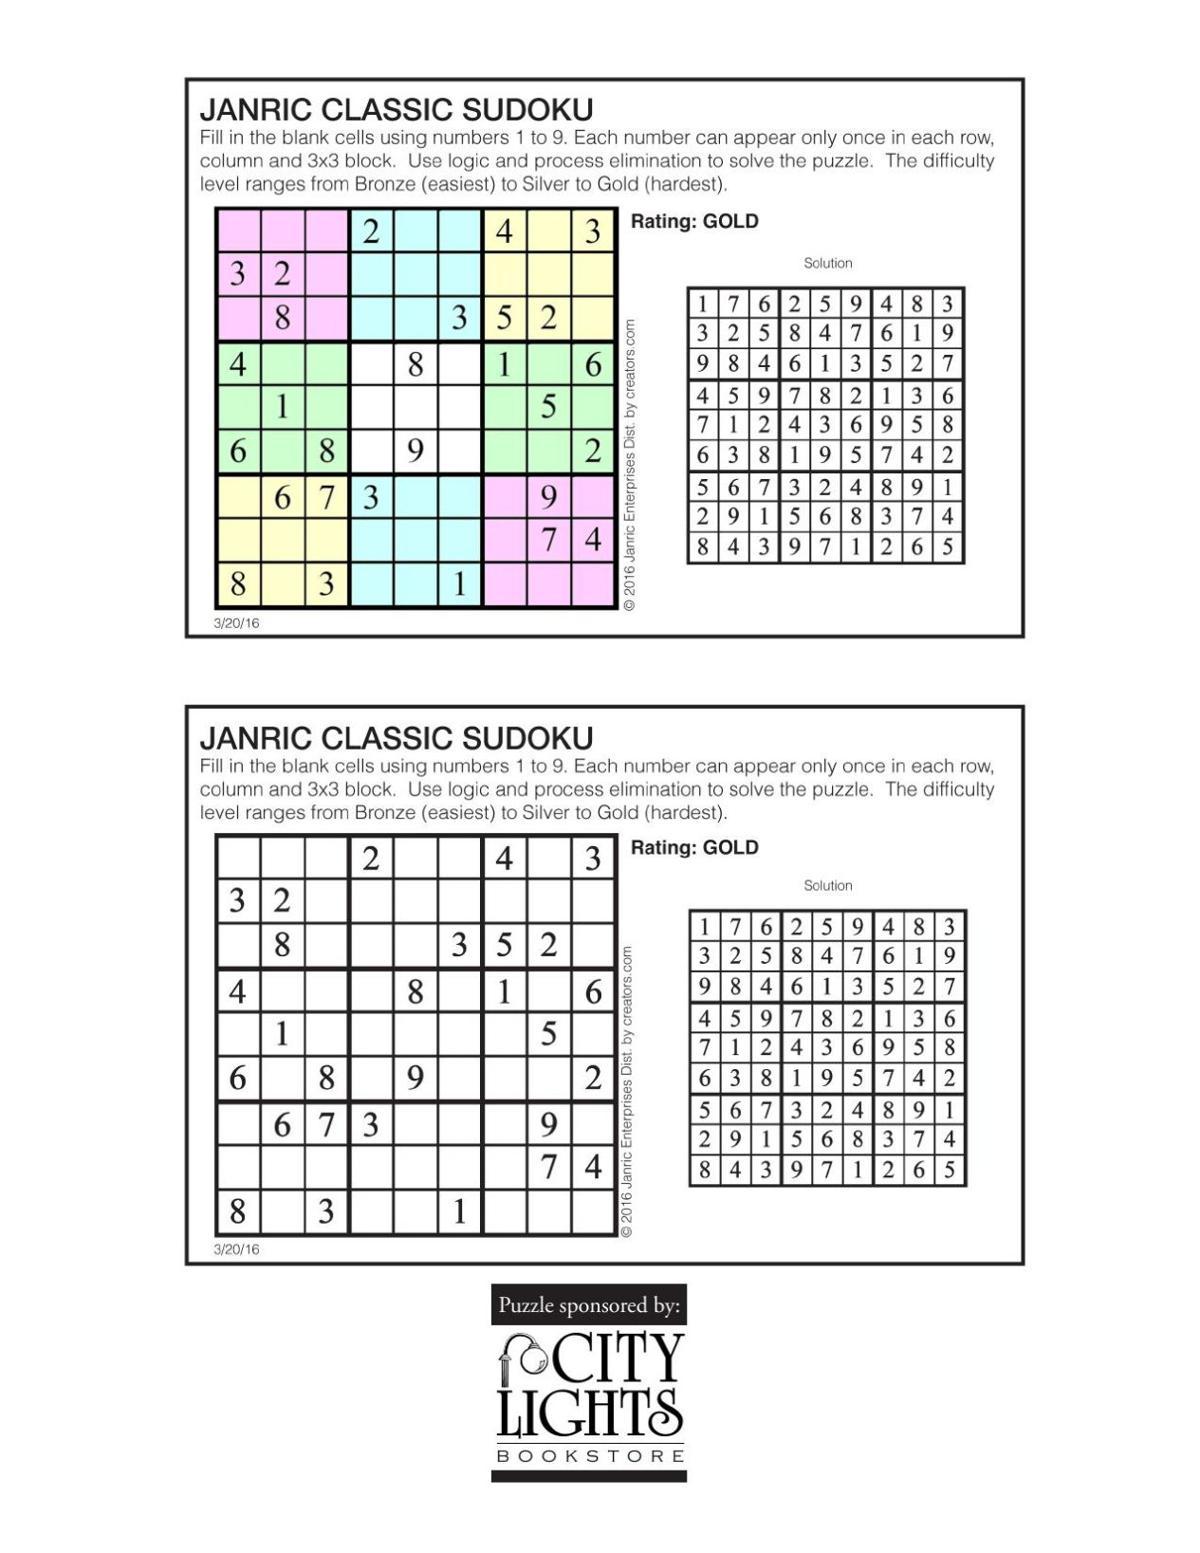 Sudoku - March 24, 2016